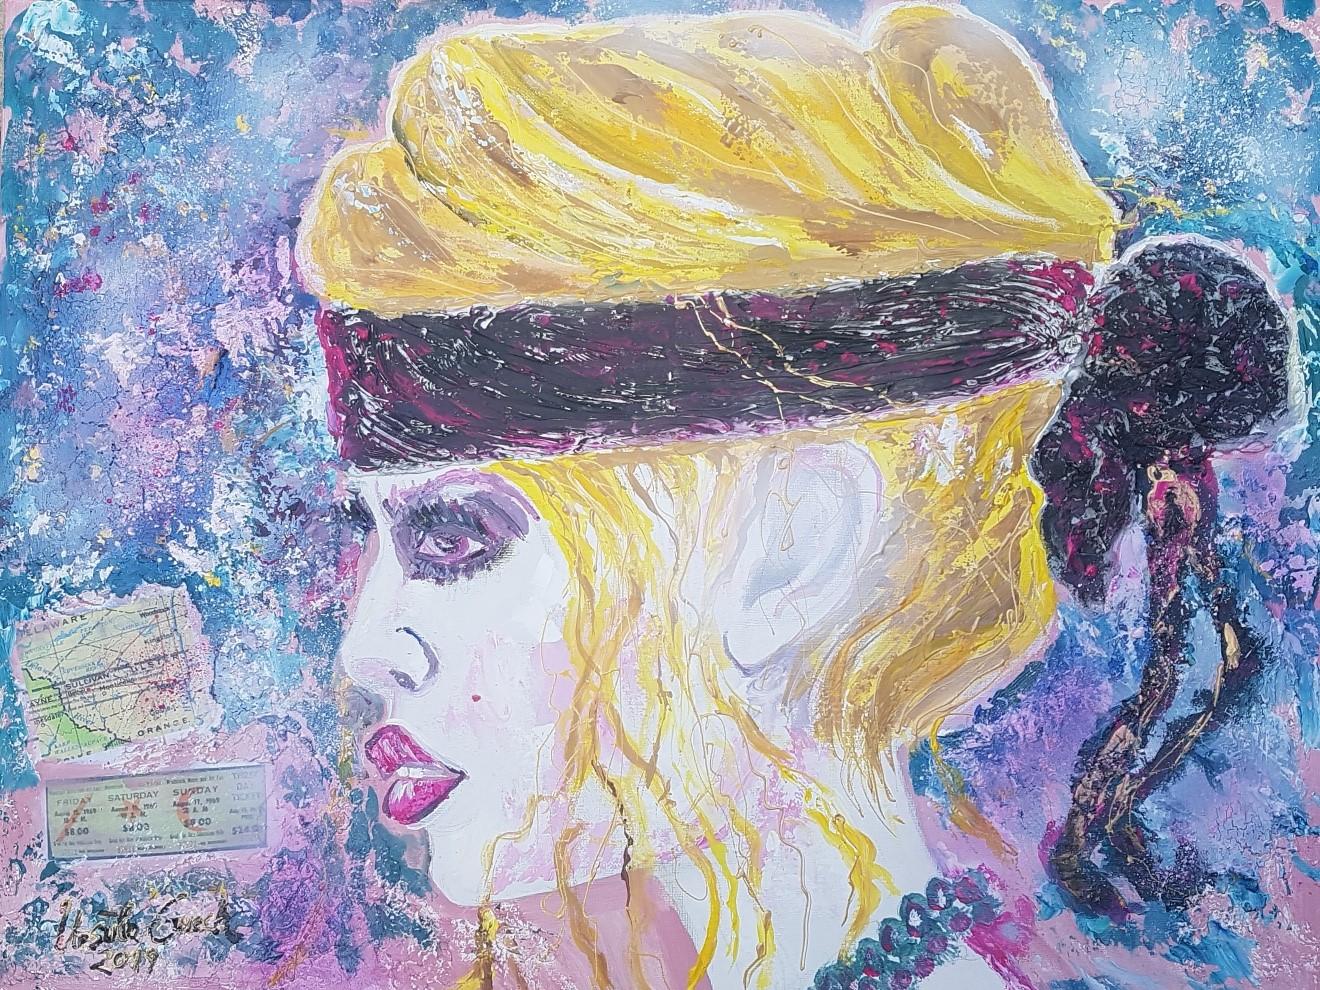 Brigitte Bardot (Woodstock) (Technic: Acryl/Collage/Mixed Media on Canvas 80 X 60 X 1,5 cm)